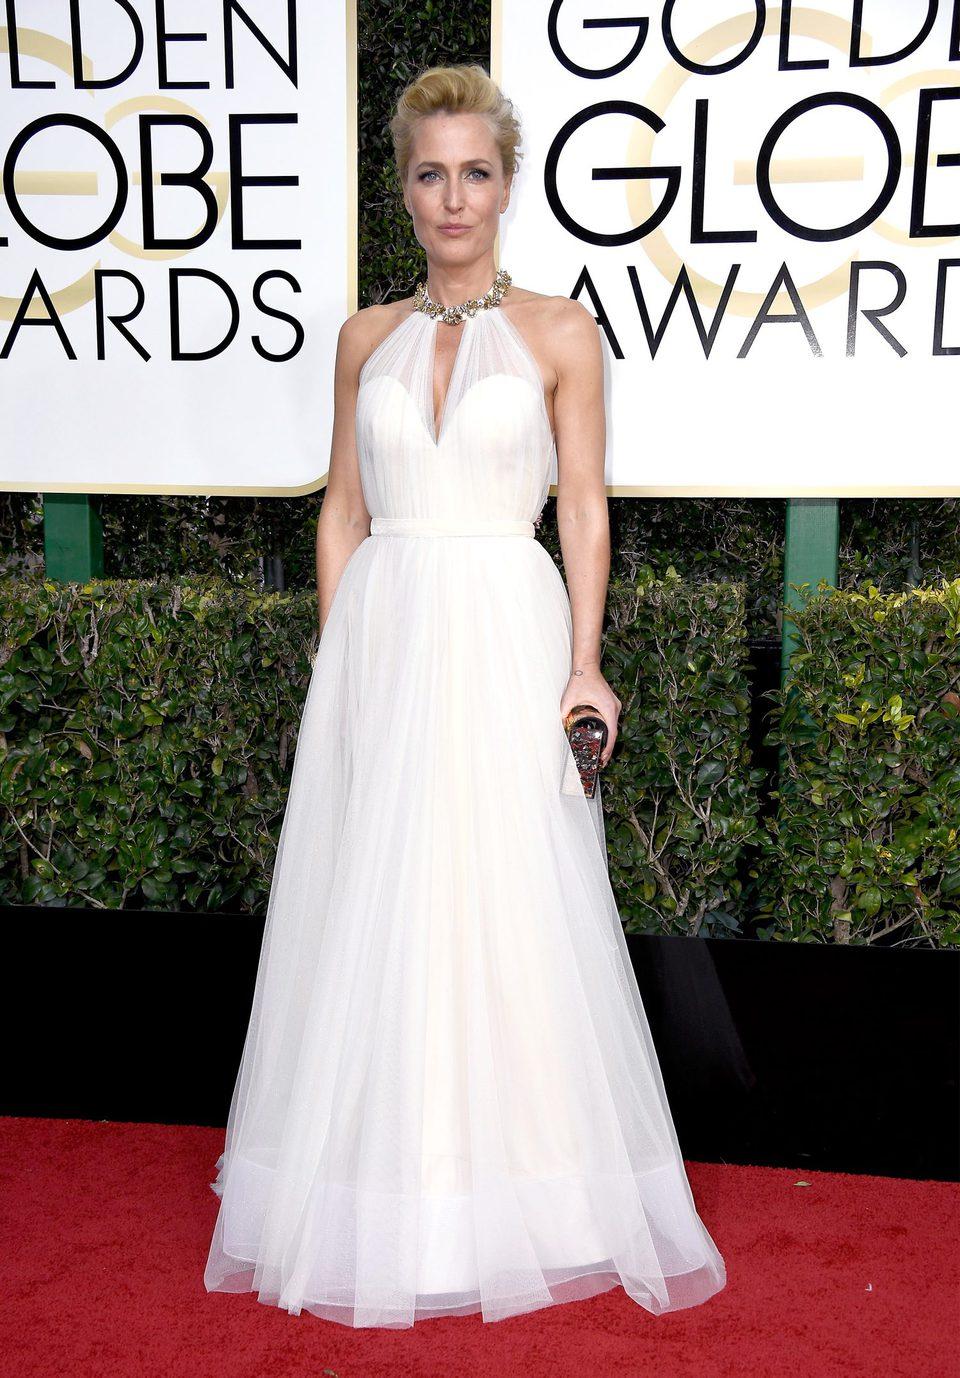 Gillian Anderson at Golden Globes 2017 red carpet